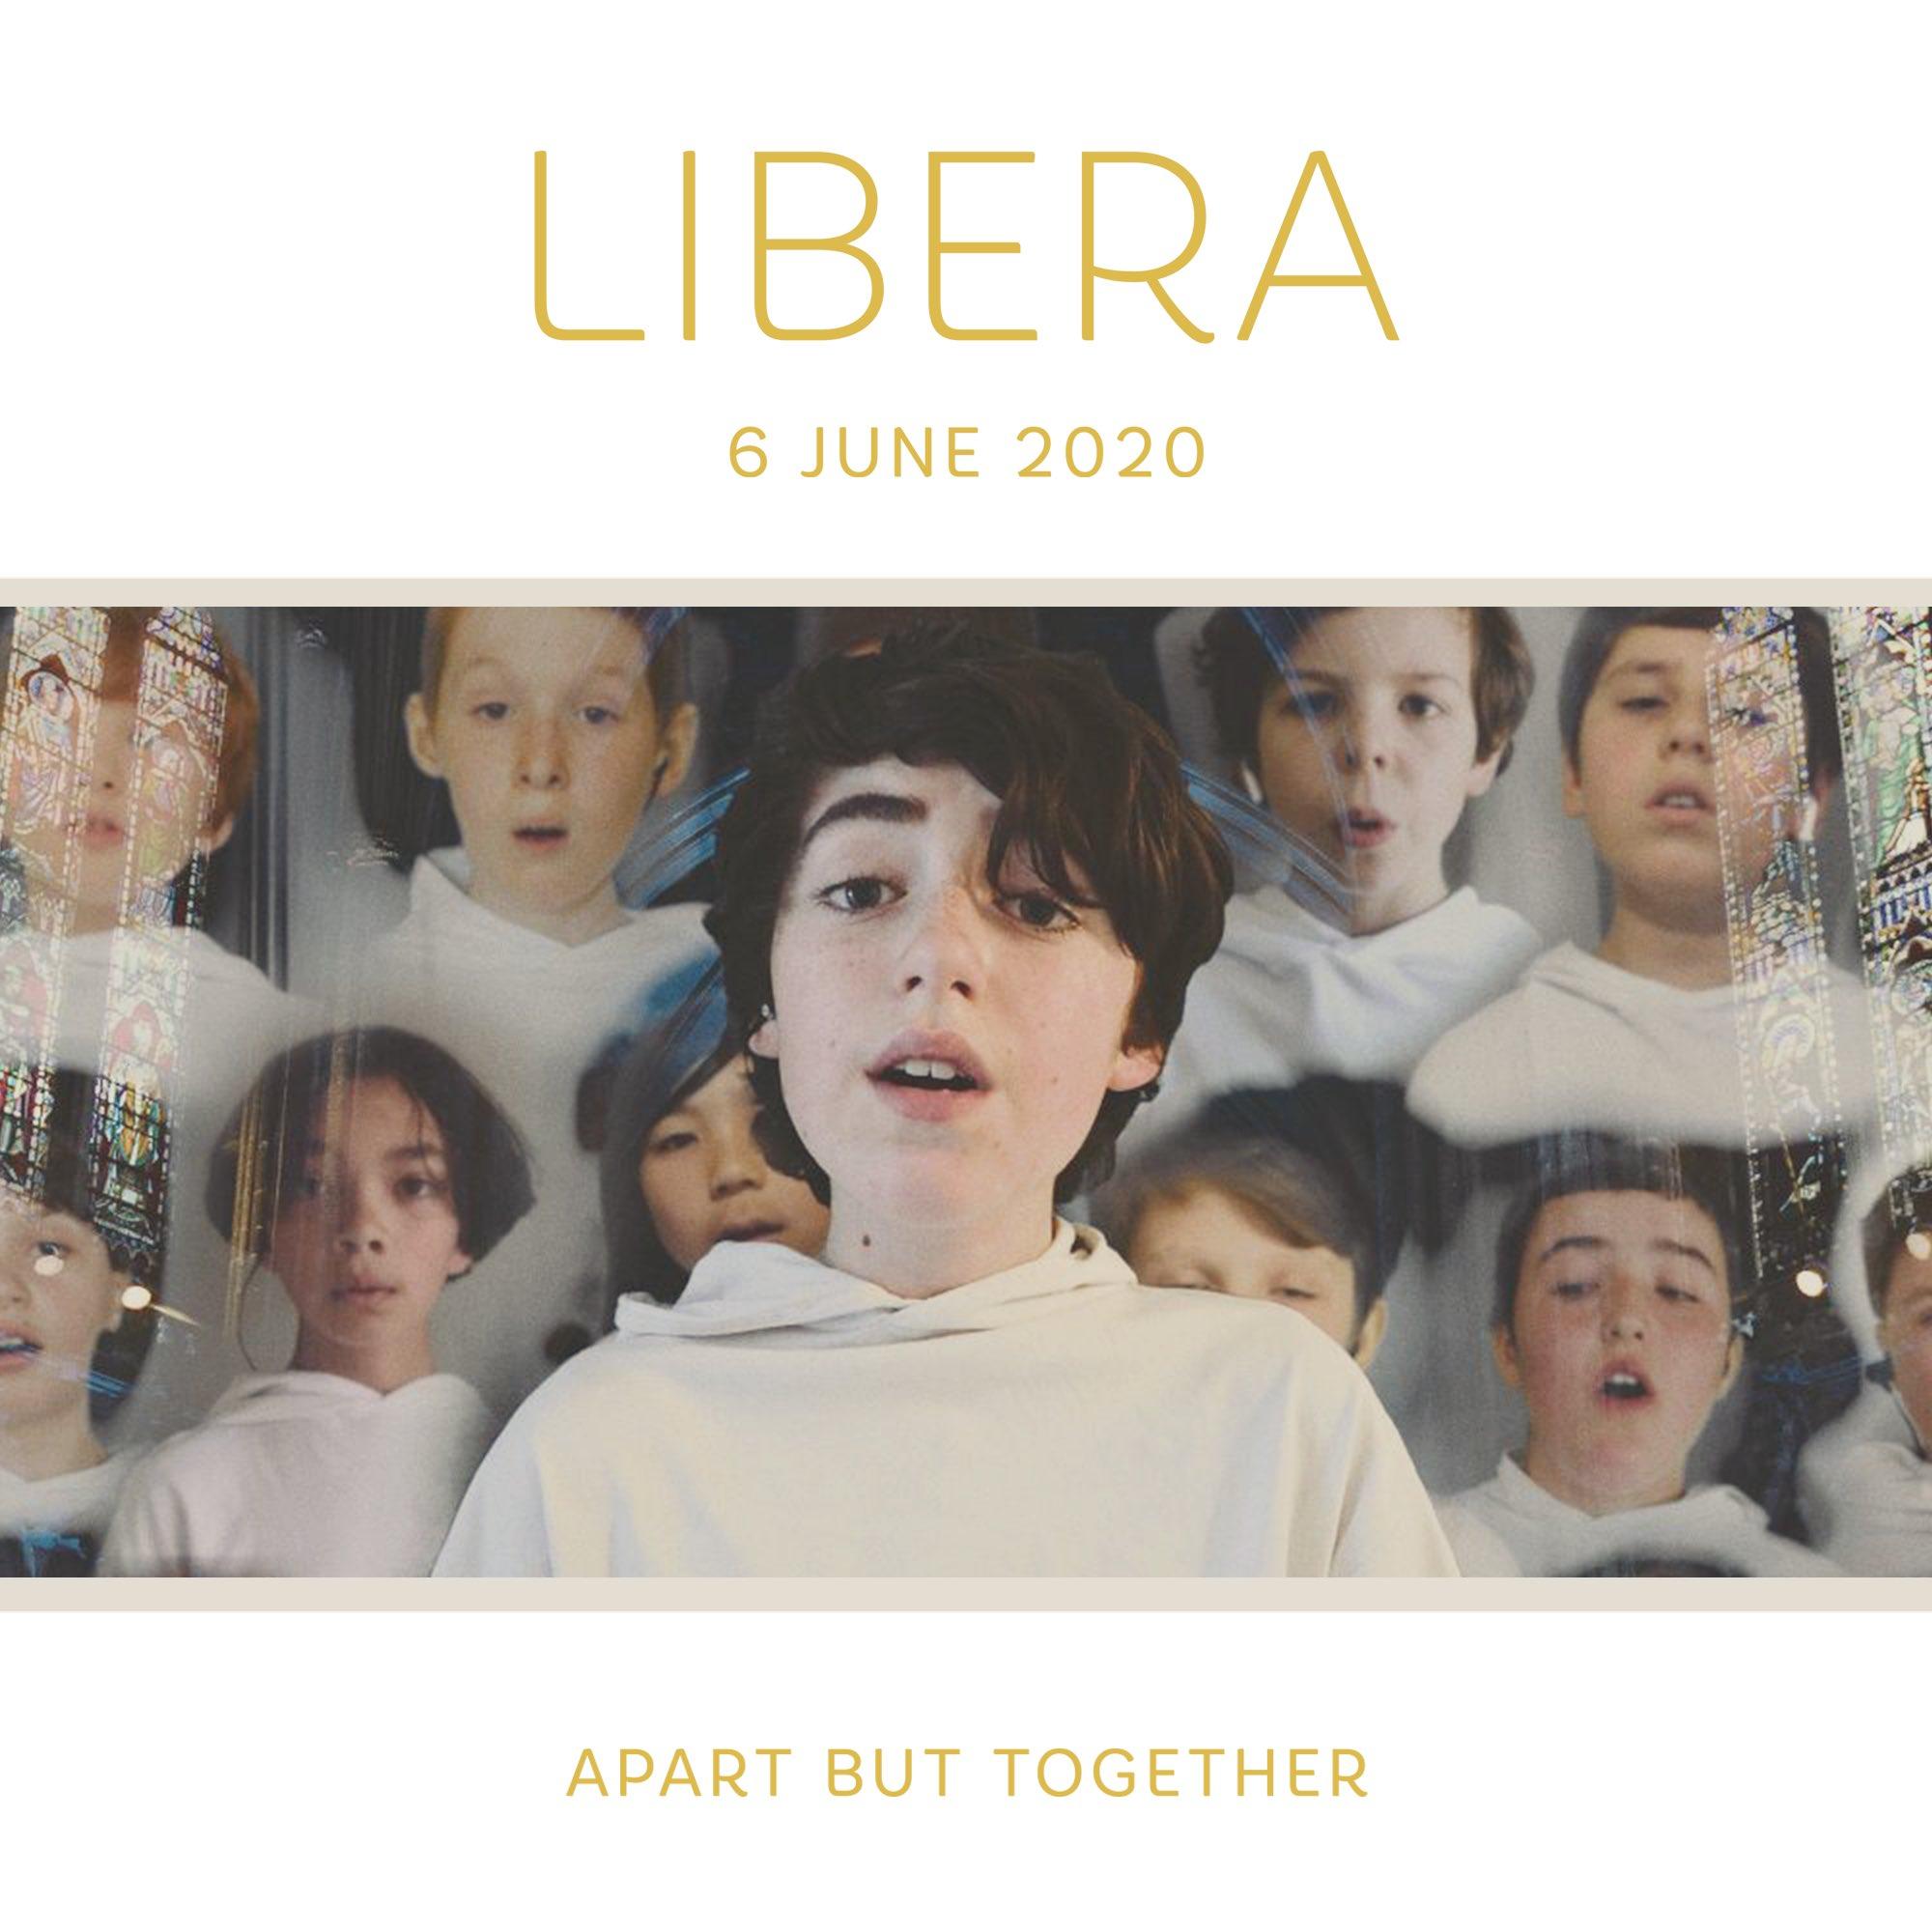 La discographie Libera - Page 2 Couv15